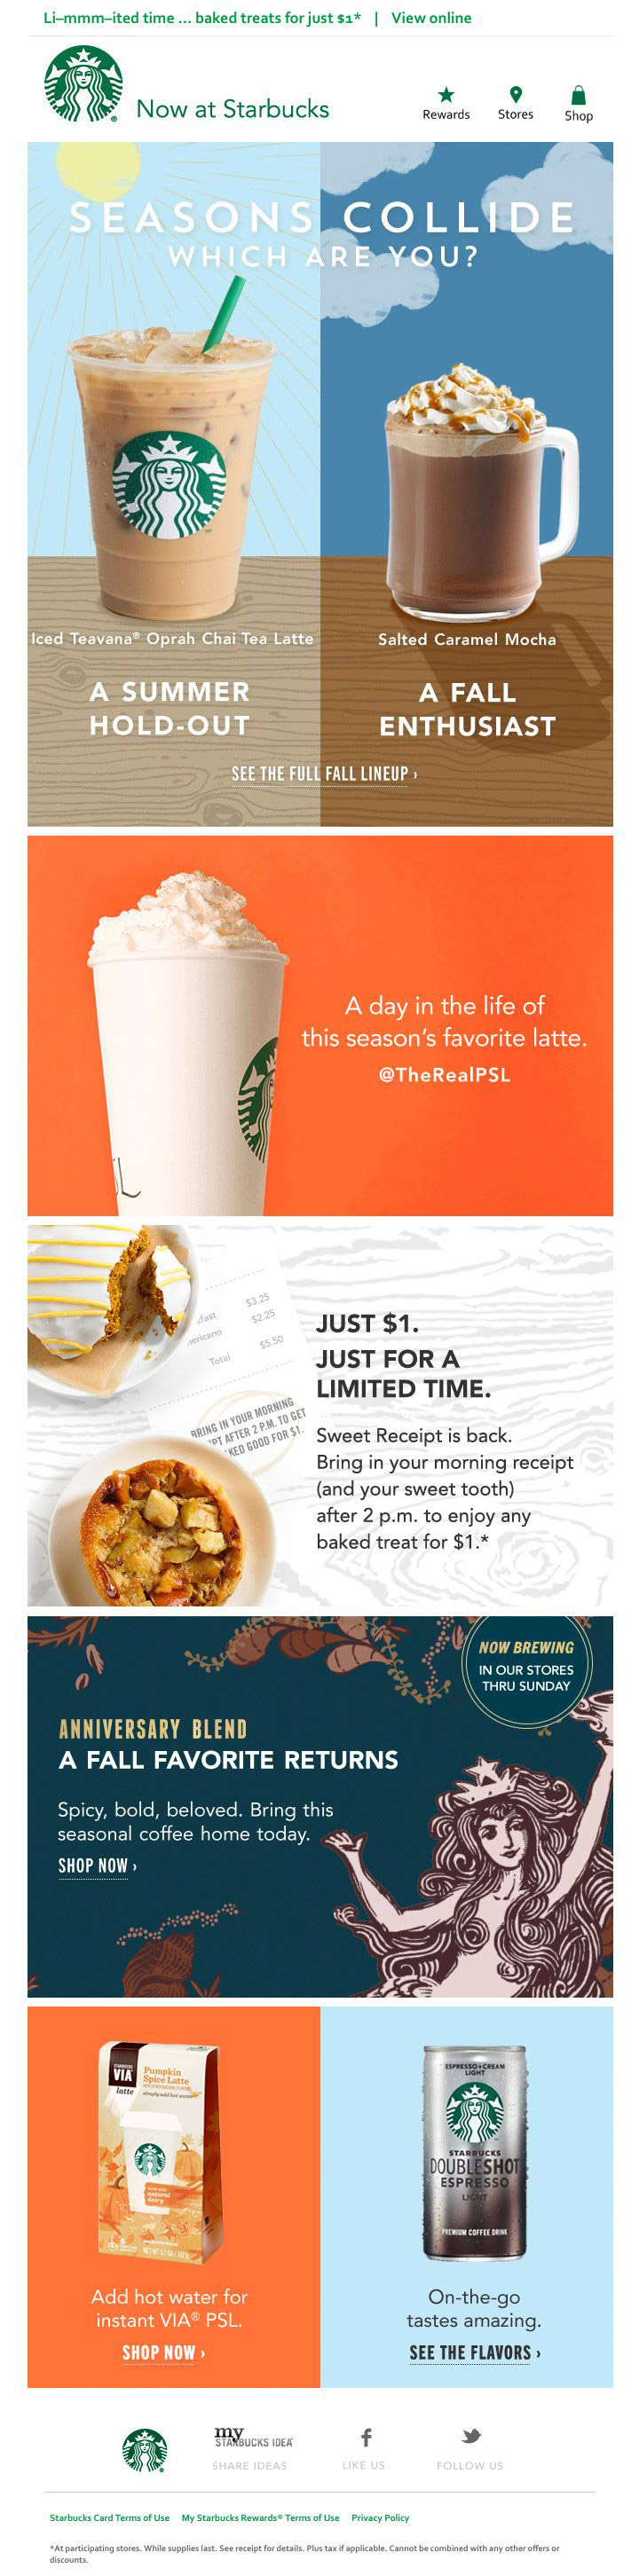 Starbucks Seasons Collide email